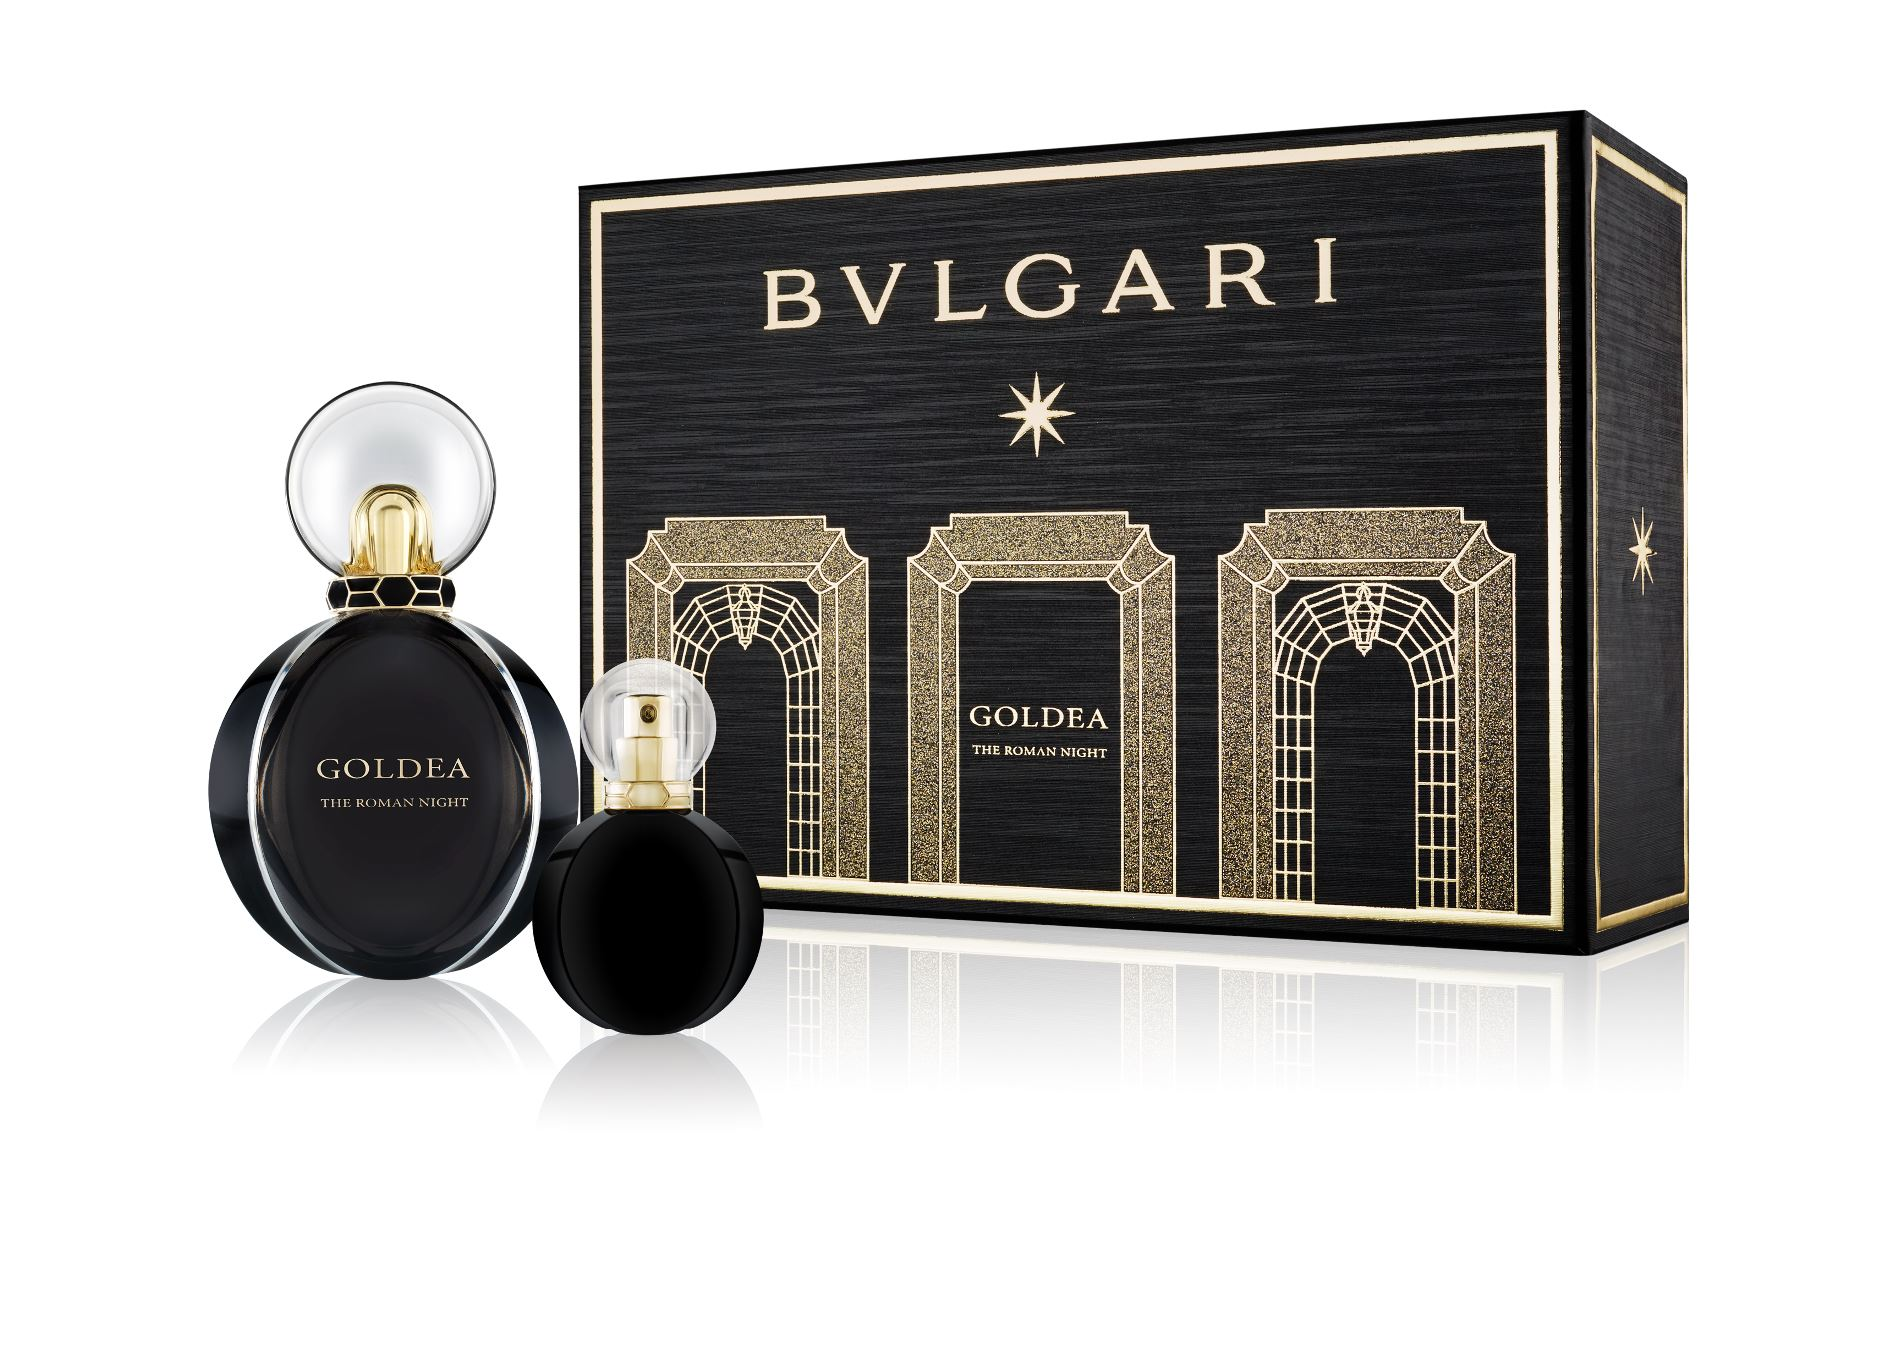 Bvlgari | Goldea The Roman Night Set (EDP50 ML and EDP15 ML)